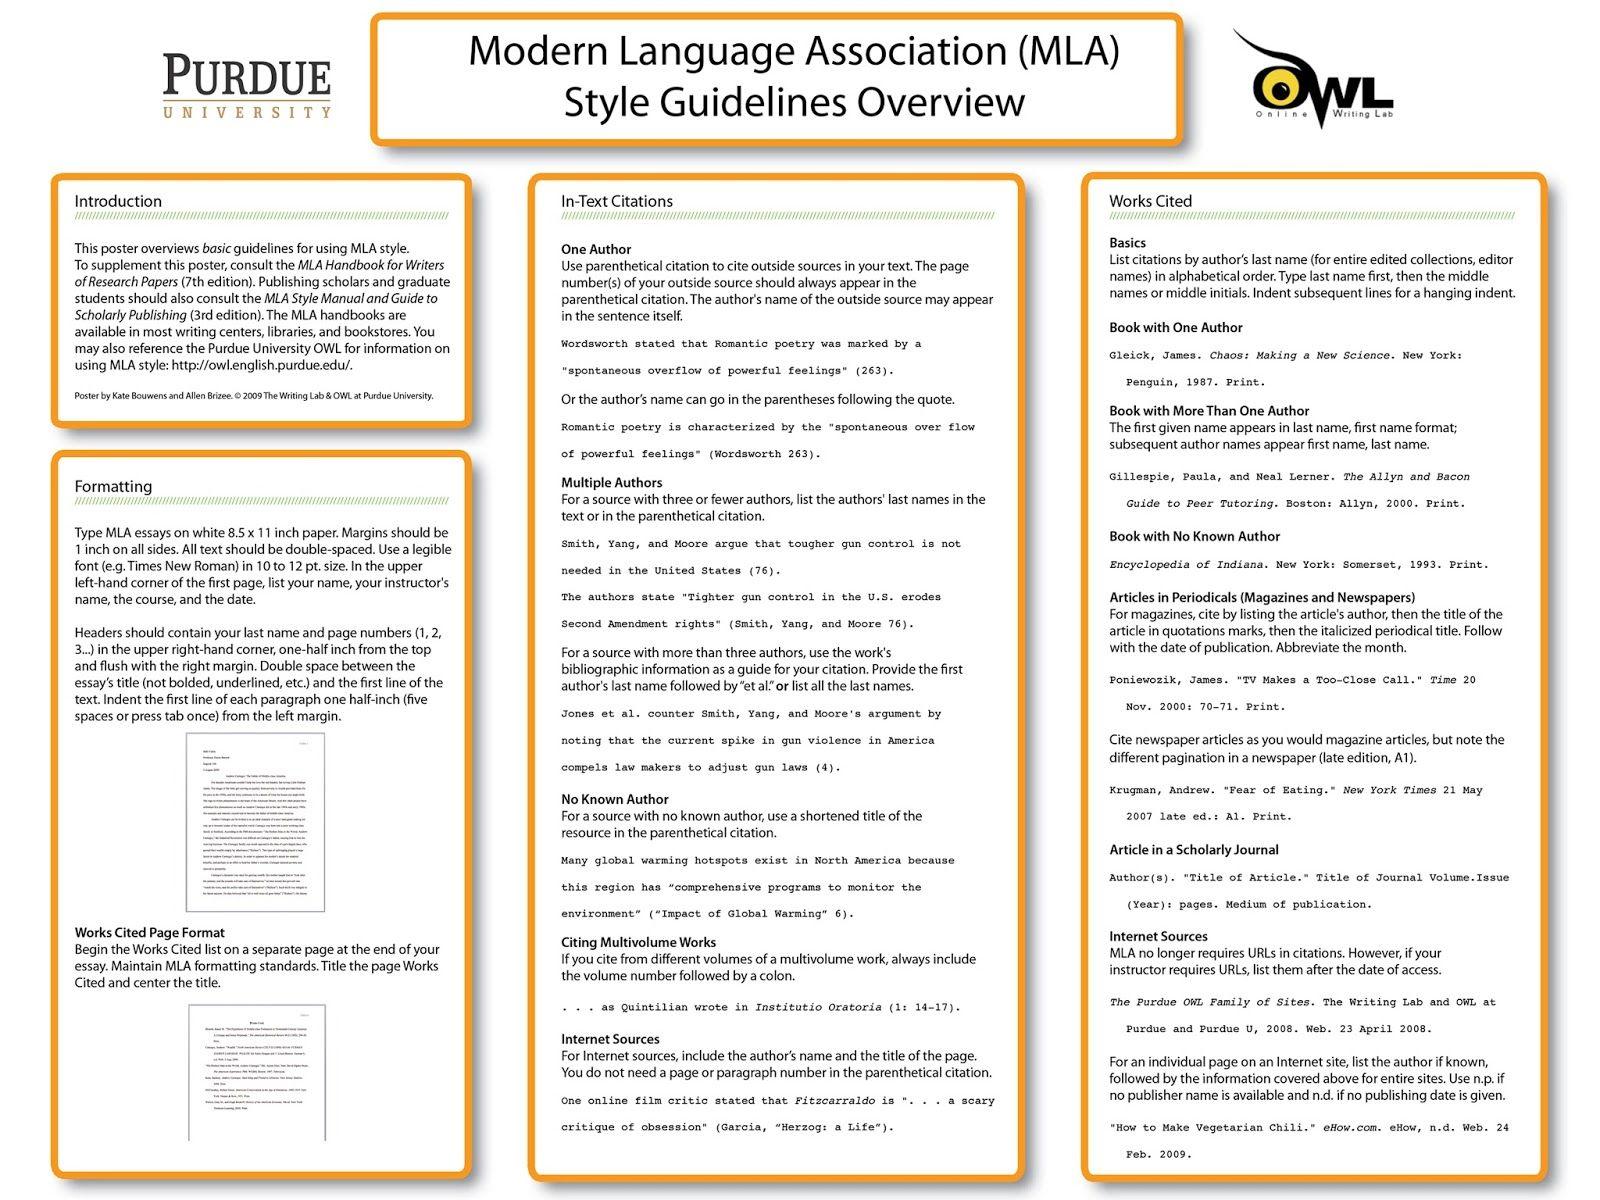 MLA Citations Format of Paper Parenthetical Citations Works Cited     Formatting the Works Cited Page